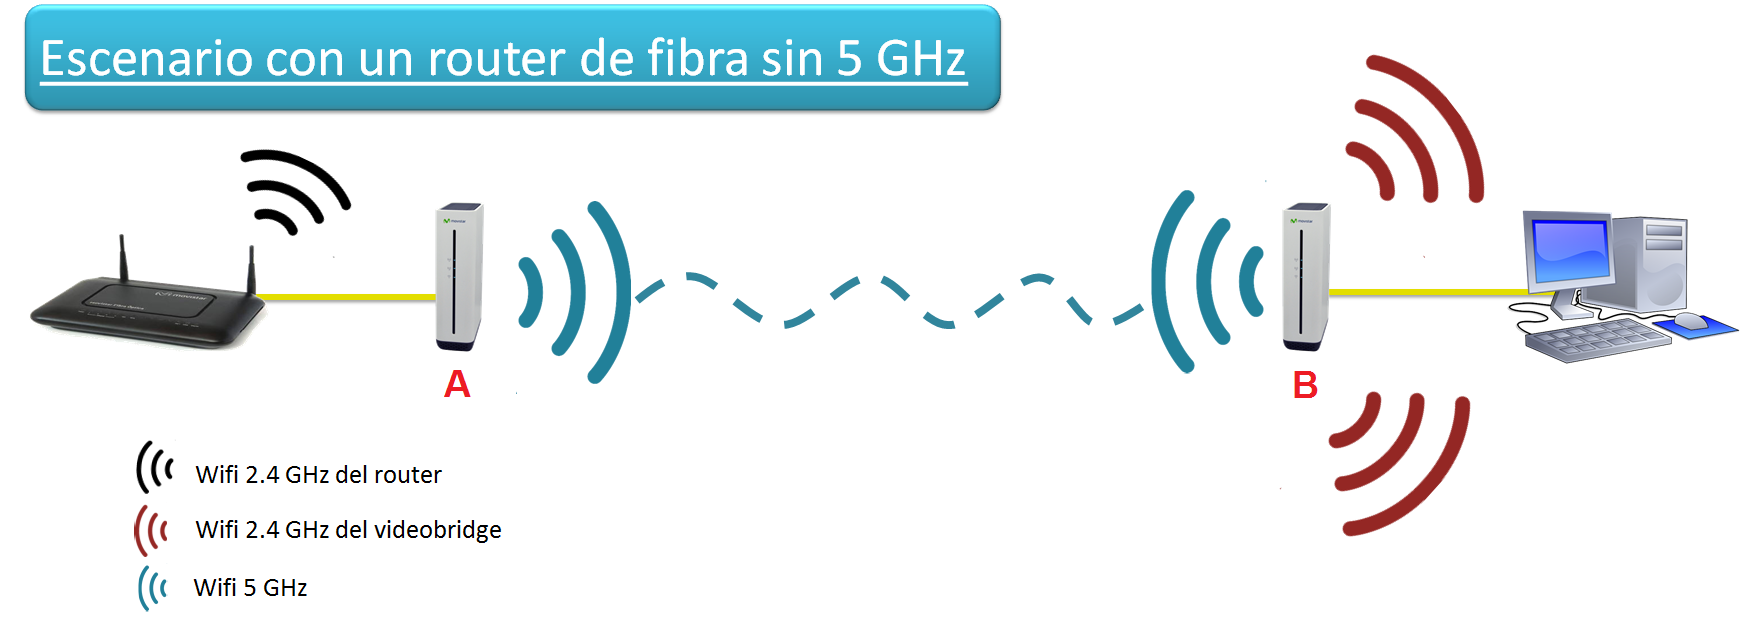 escenario con router fibra.png